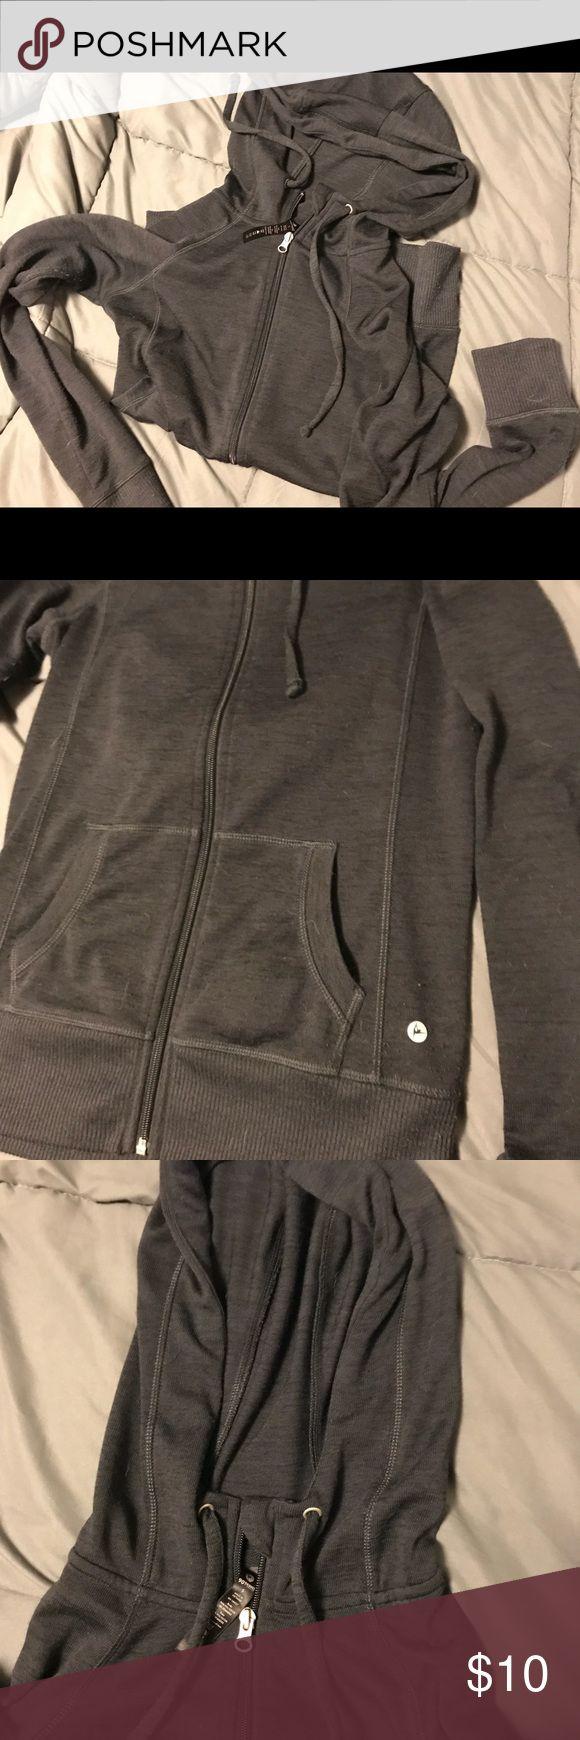 Navy Blue Zip up hoodie Great condition! Jackets & Coats